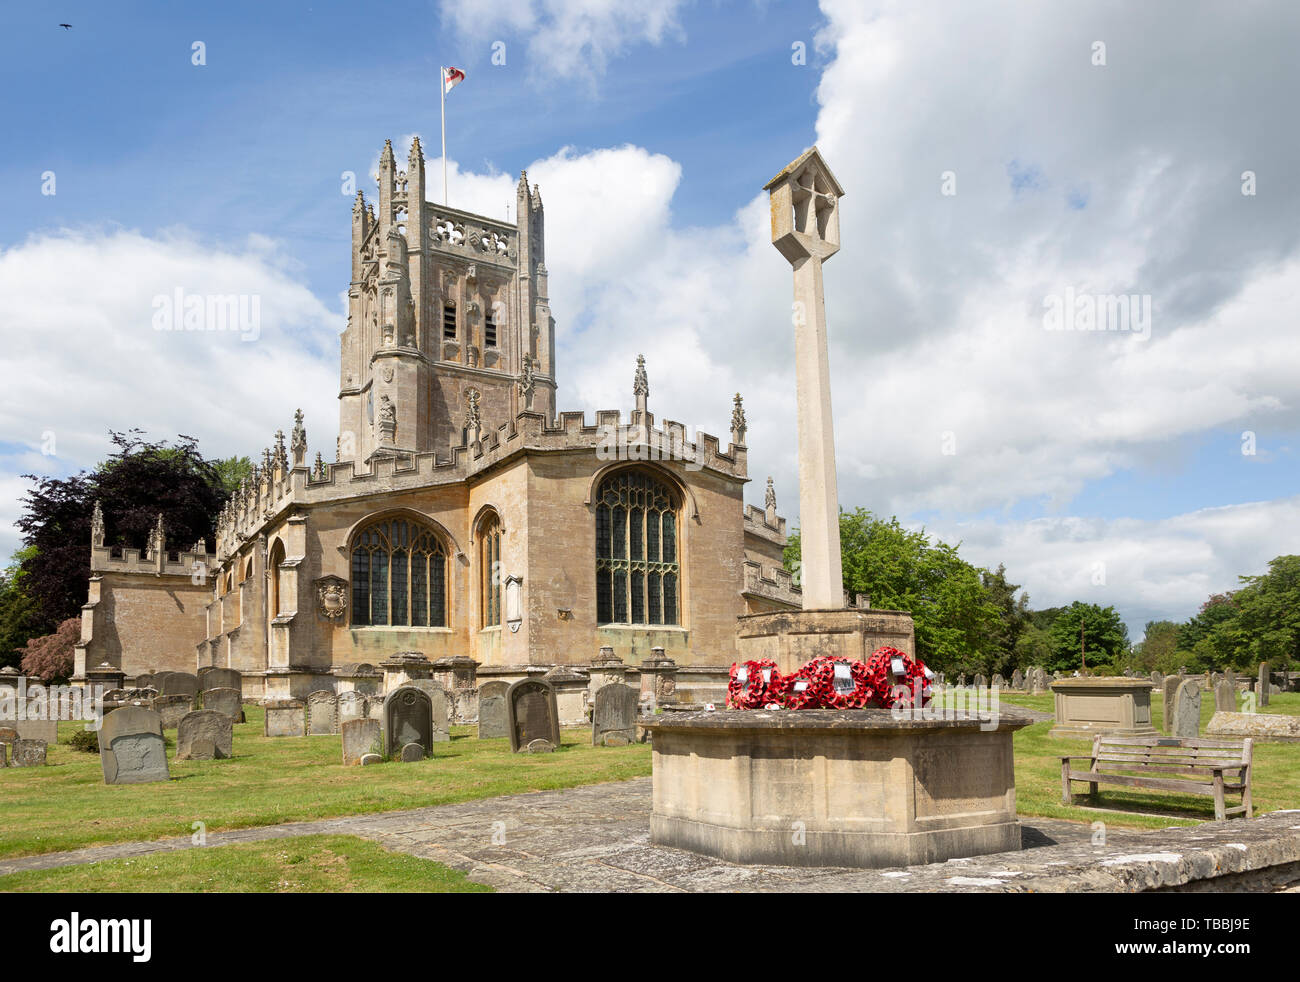 Cotswolds historic stone building churchyard of Church of Saint Mary, Fairford, Gloucestershire, England, UK - Stock Image